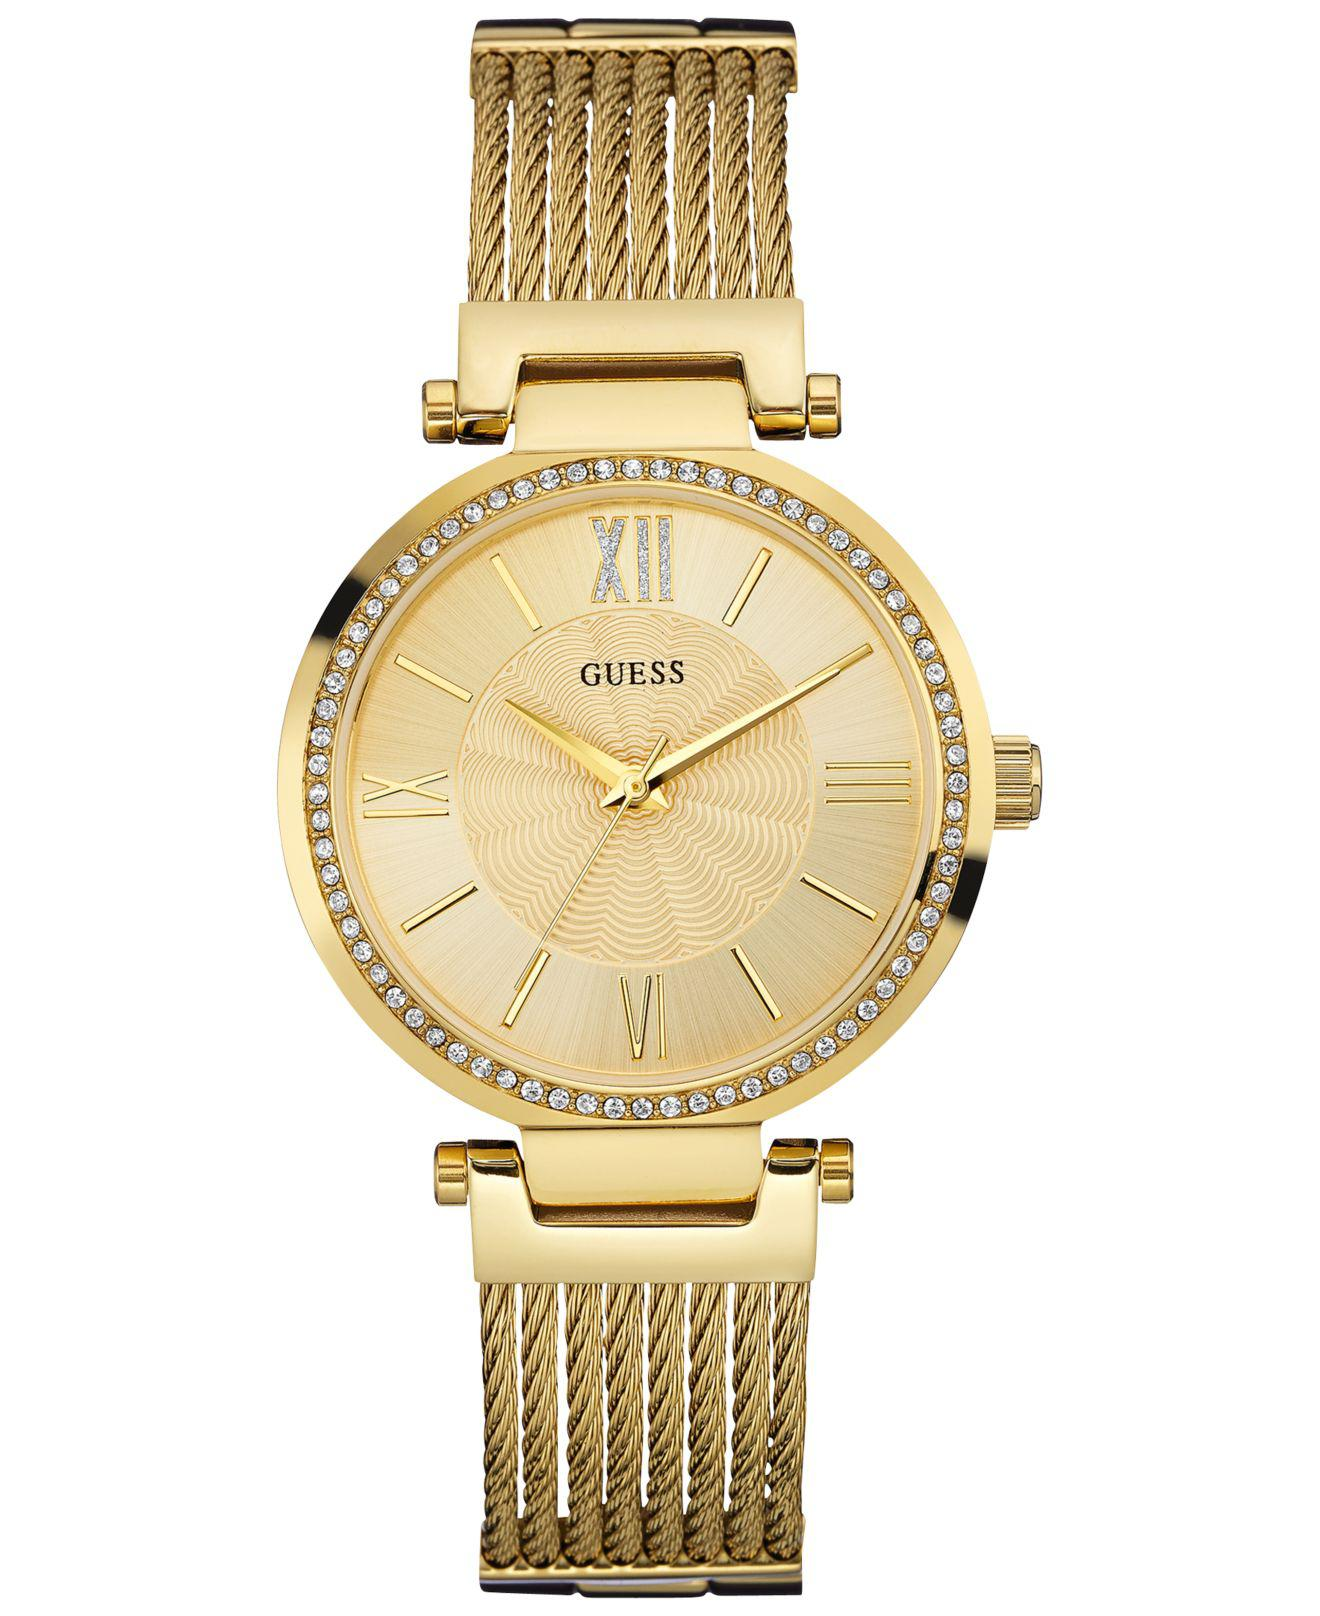 8356bacae14b Guess - Metallic Women s Gold-tone Stainless Steel Self-adjustable Bracelet  Watch 36mm U0638l2. View fullscreen